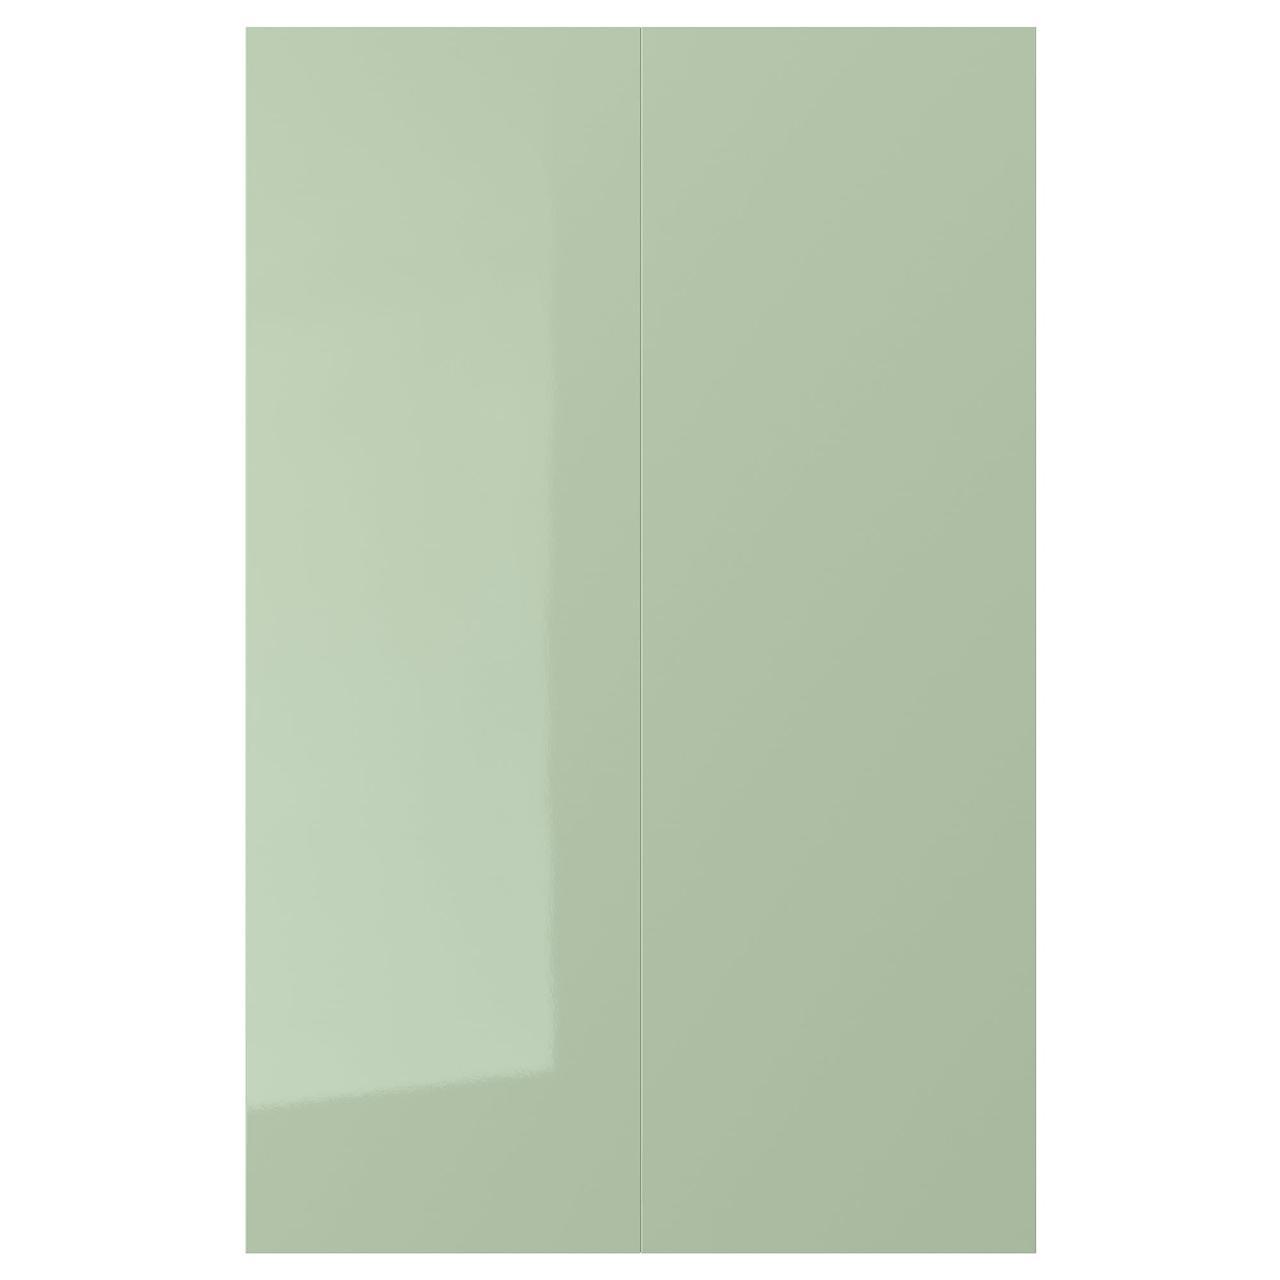 КАЛЛАРП Дверца д/напольн углового шк, 2шт, глянцевый светло-зеленый